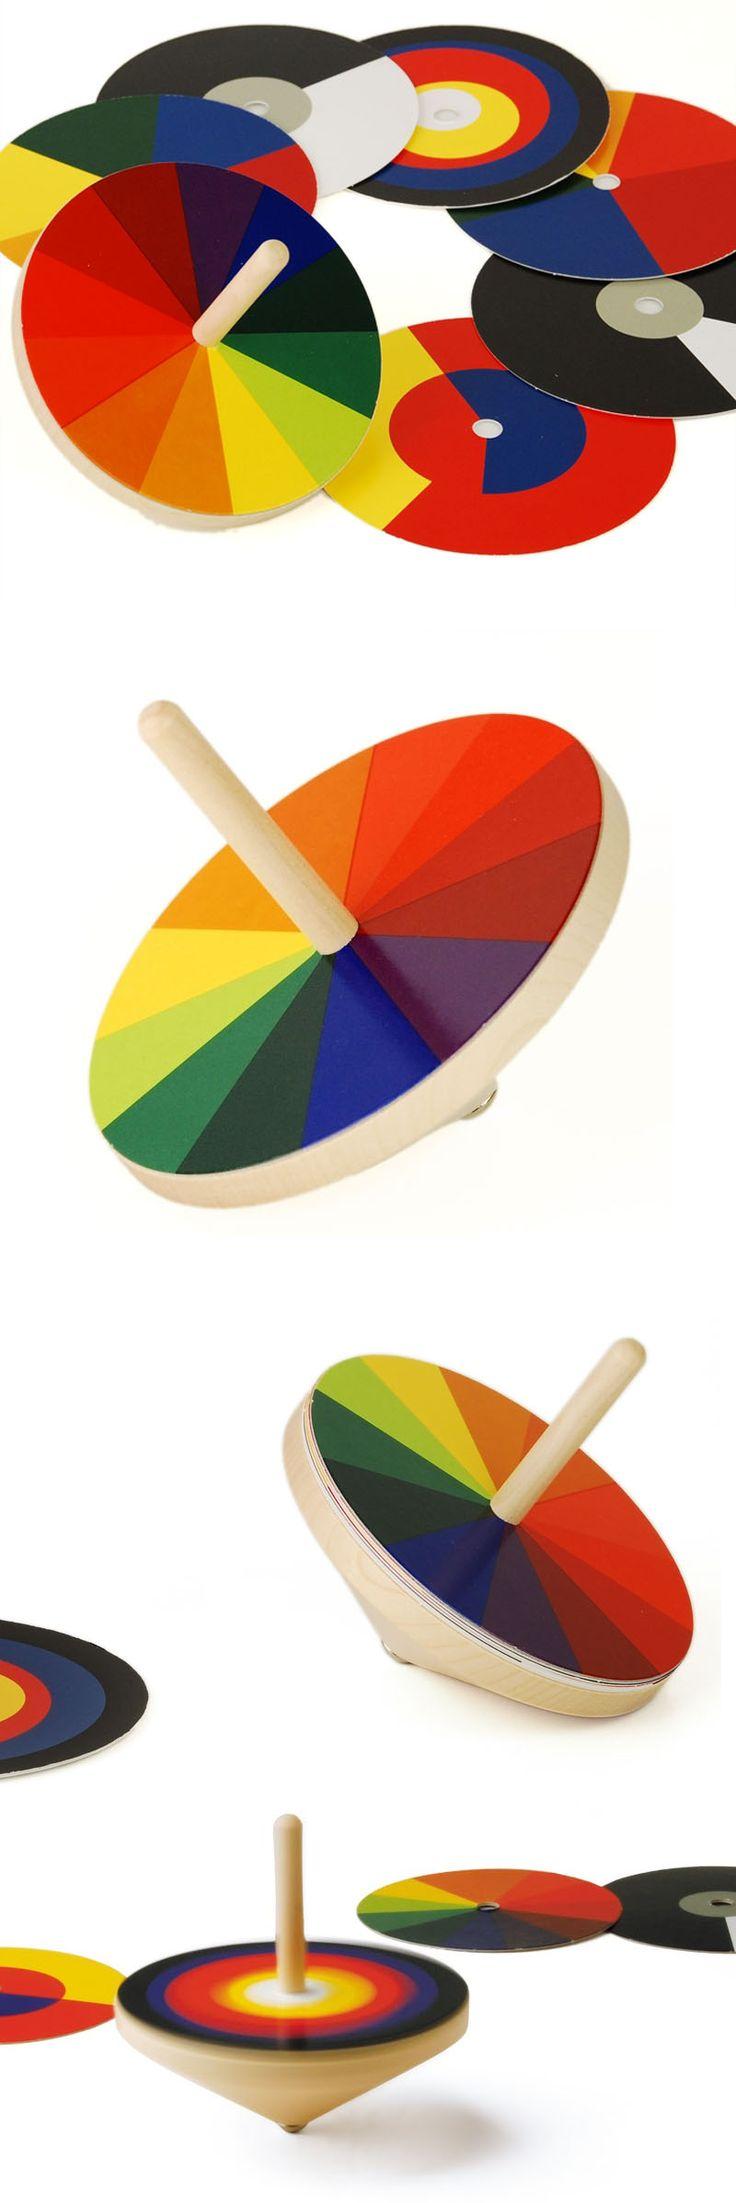 50 best bauhaus toys images on pinterest wood toys wooden toys naef bauhaus optischer farbmischer spinning top toy buycottarizona